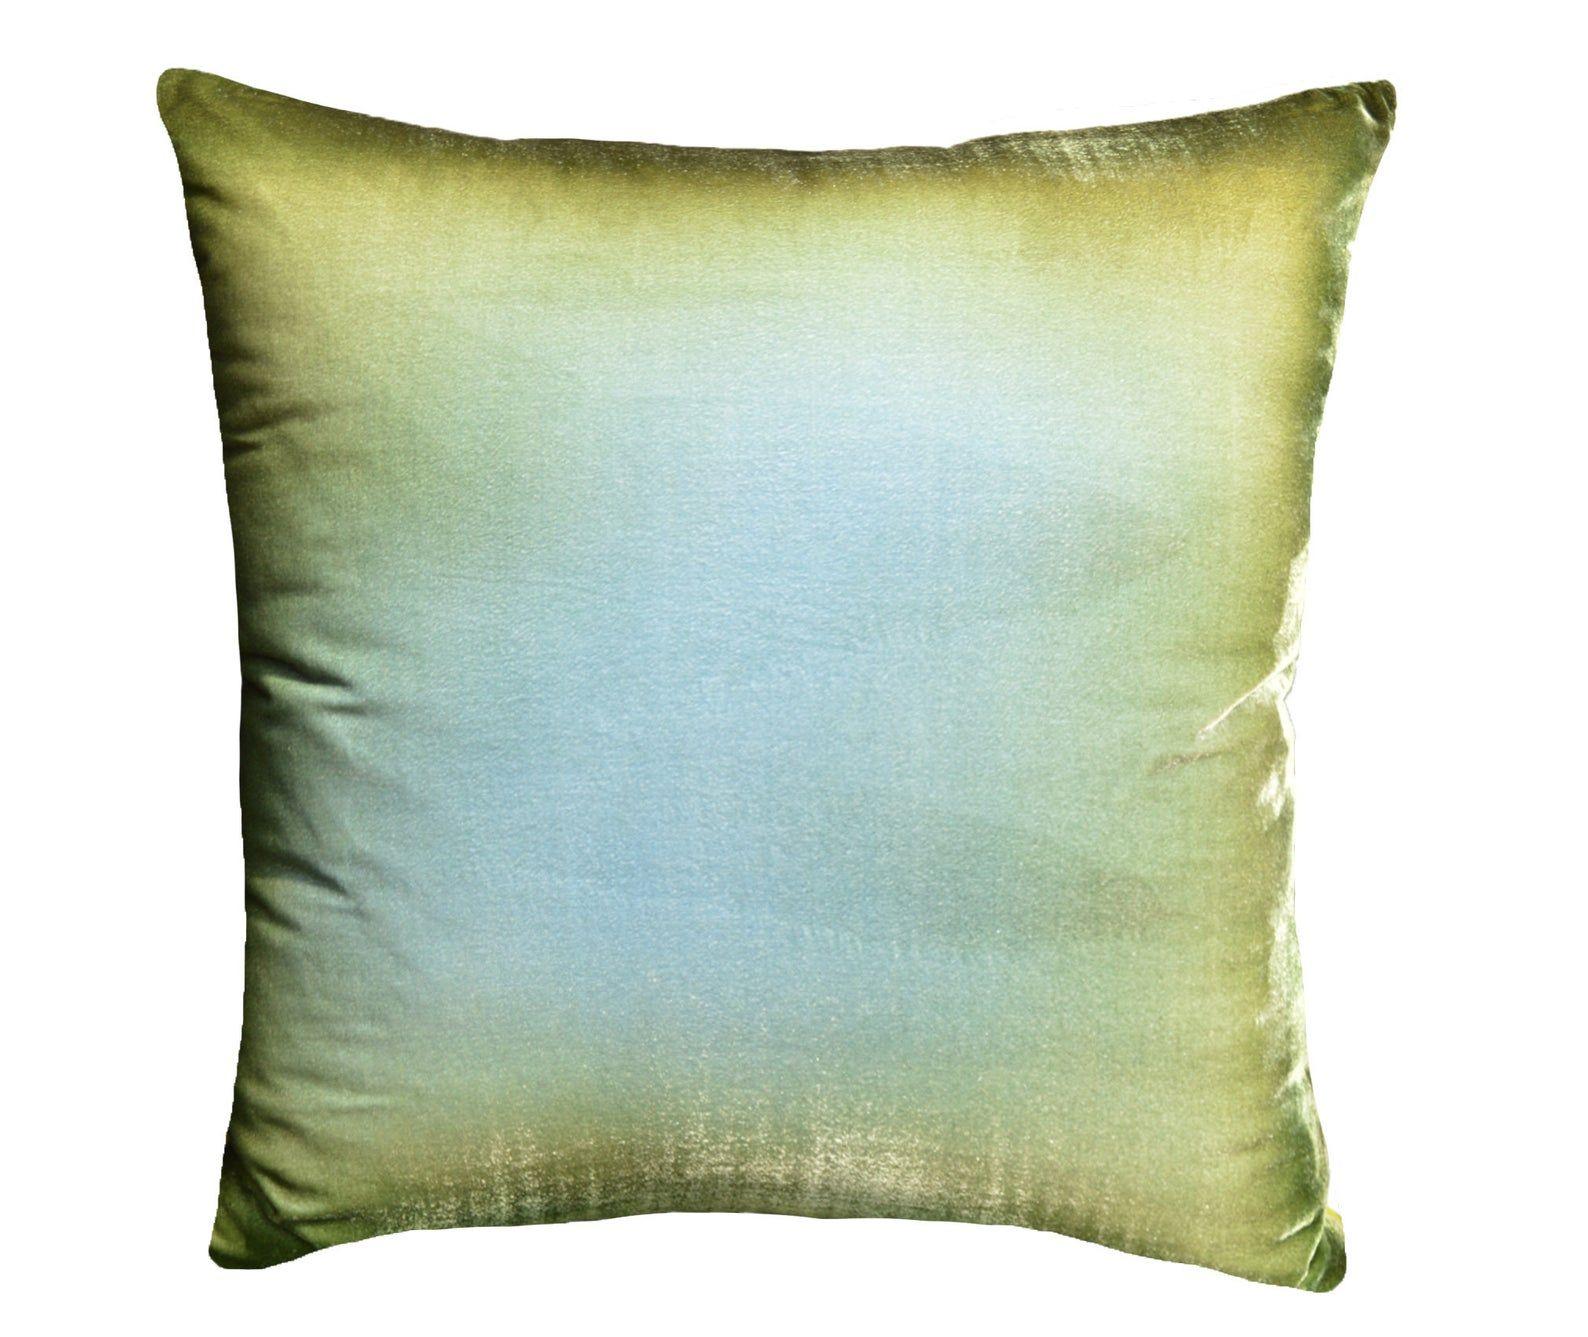 High-End Green Ombré Velvet Throw Pillow Cover, Hand Painted Ombre on Luxurious Silk Velvet. Green Ombre throw pillow by Fabric17 Studio